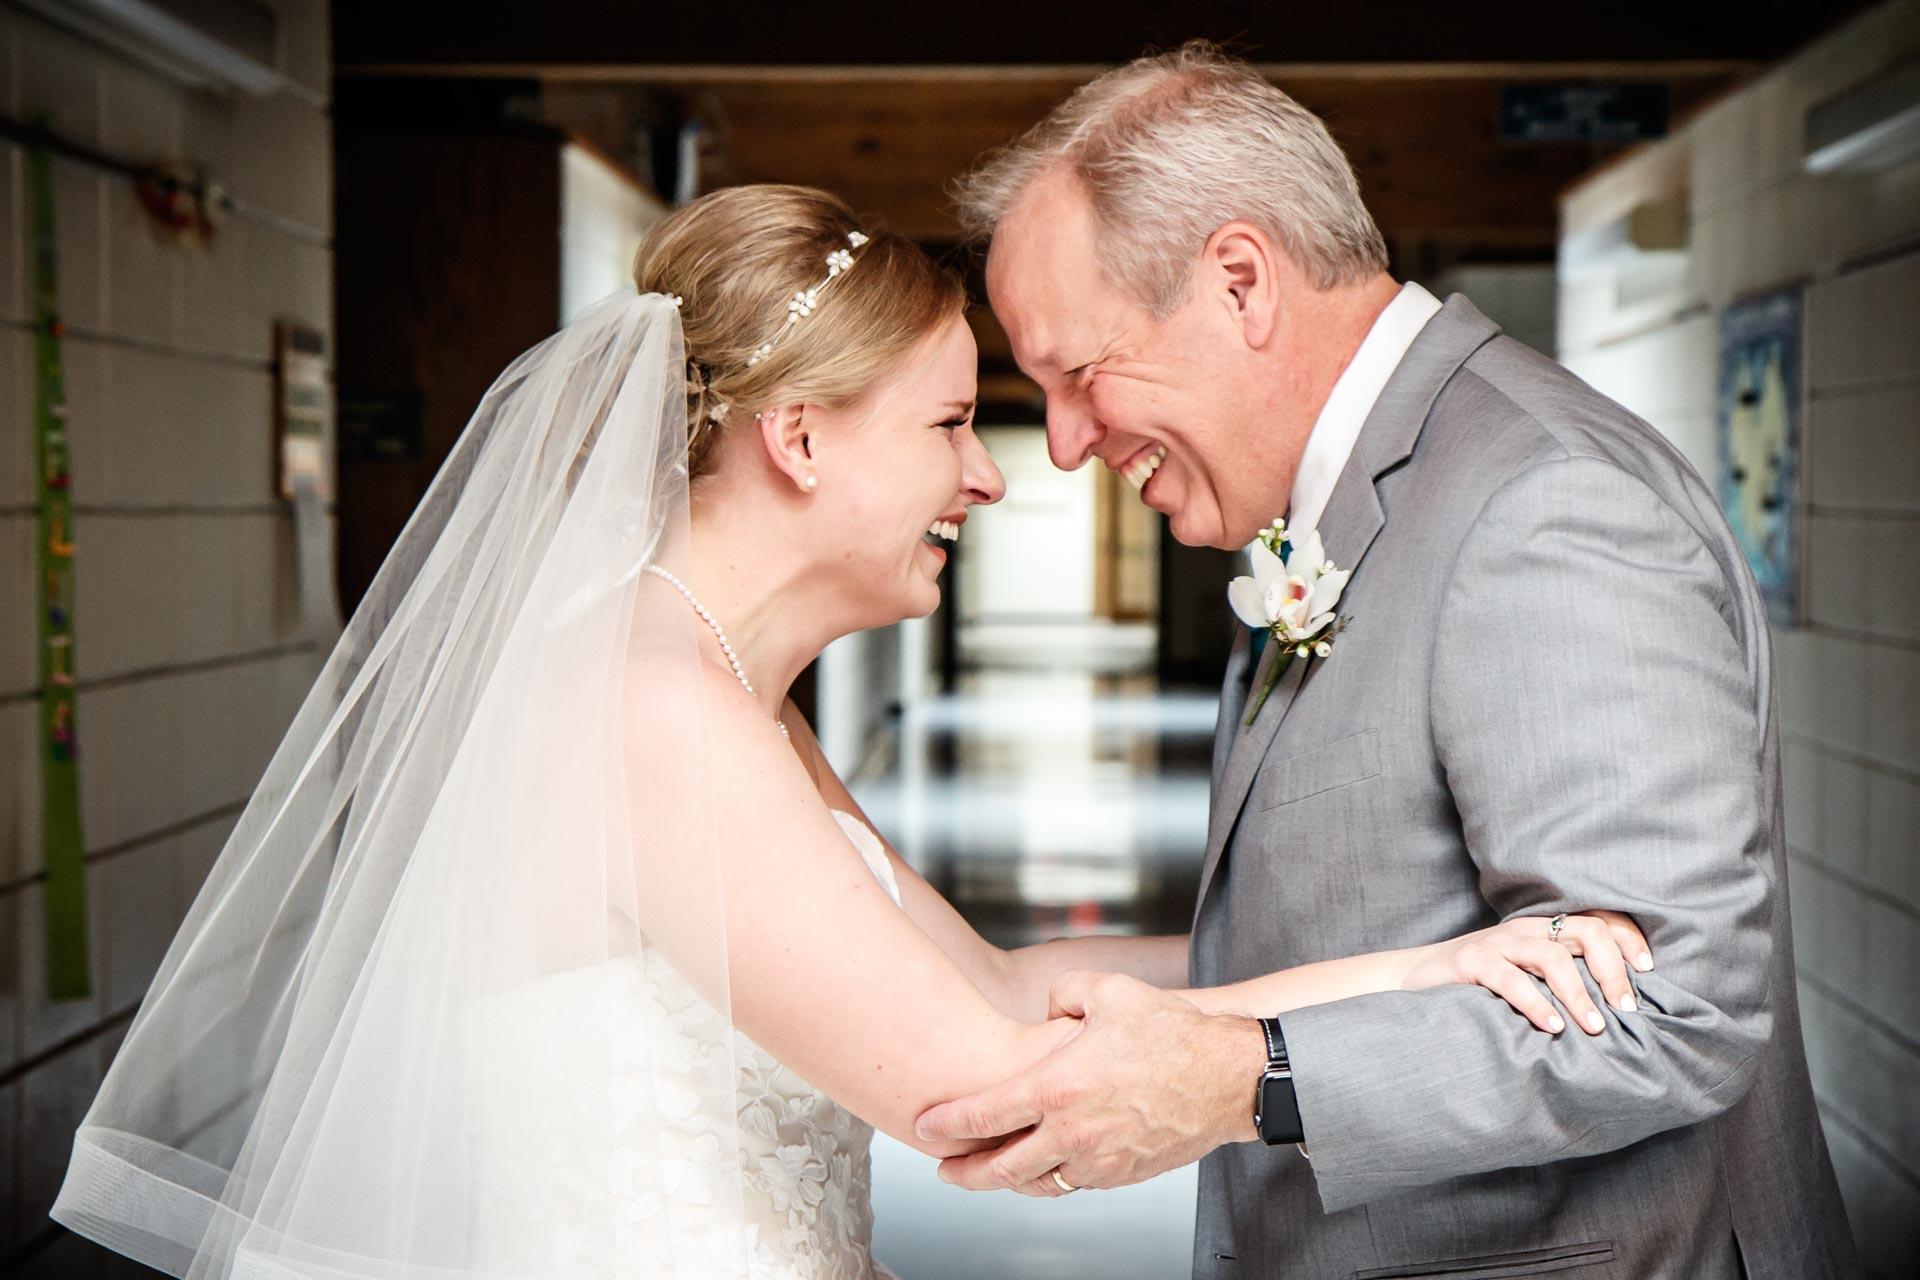 wedding-2-adam-shea-photography-green-bay-appleton-neenah-photographer-04.jpg